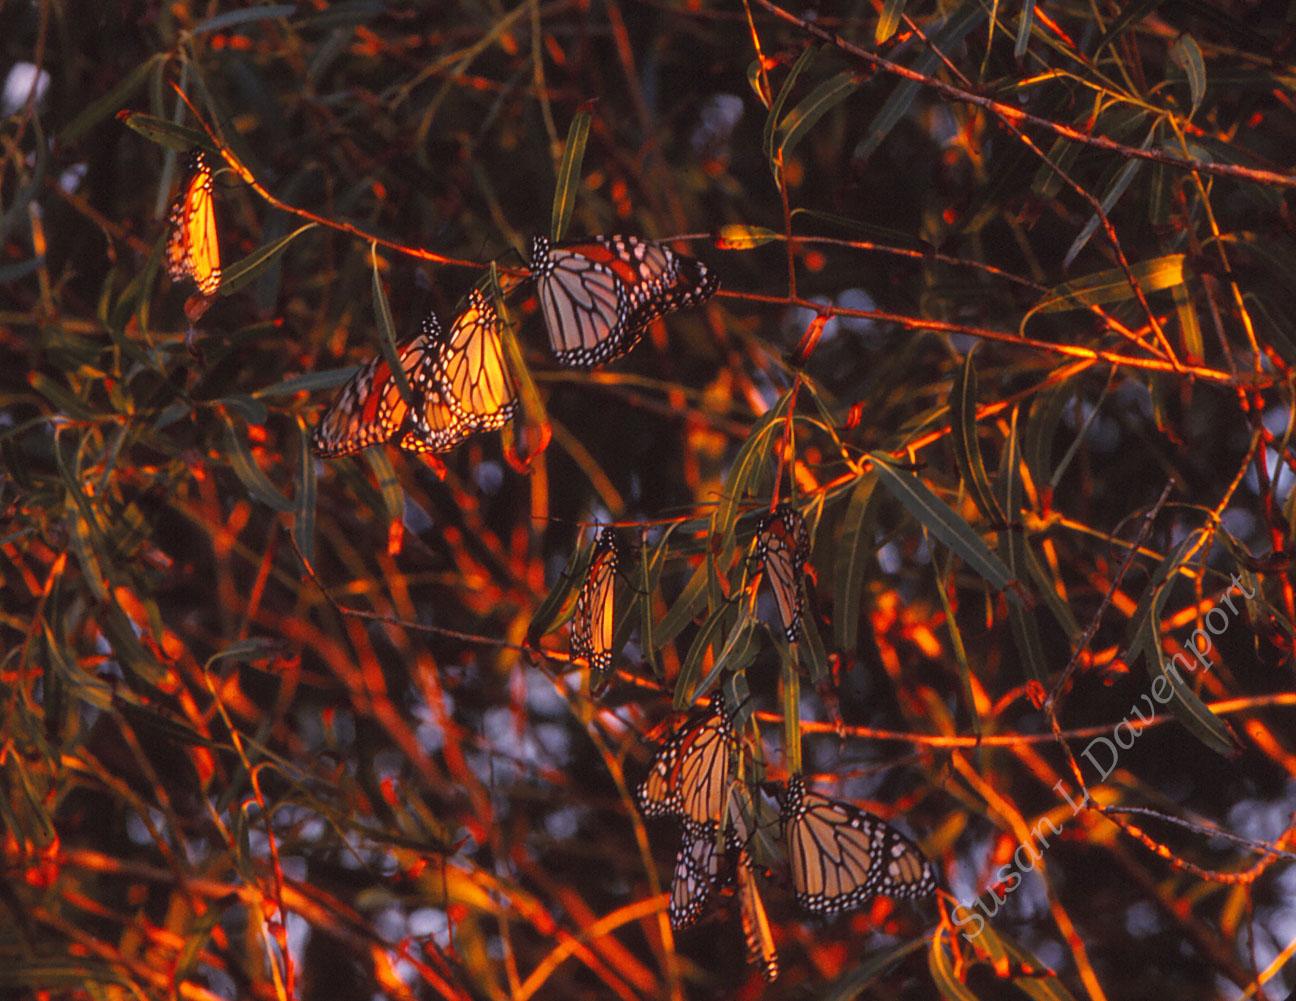 Migrating Beauties - Photo by Susan L. Davenport